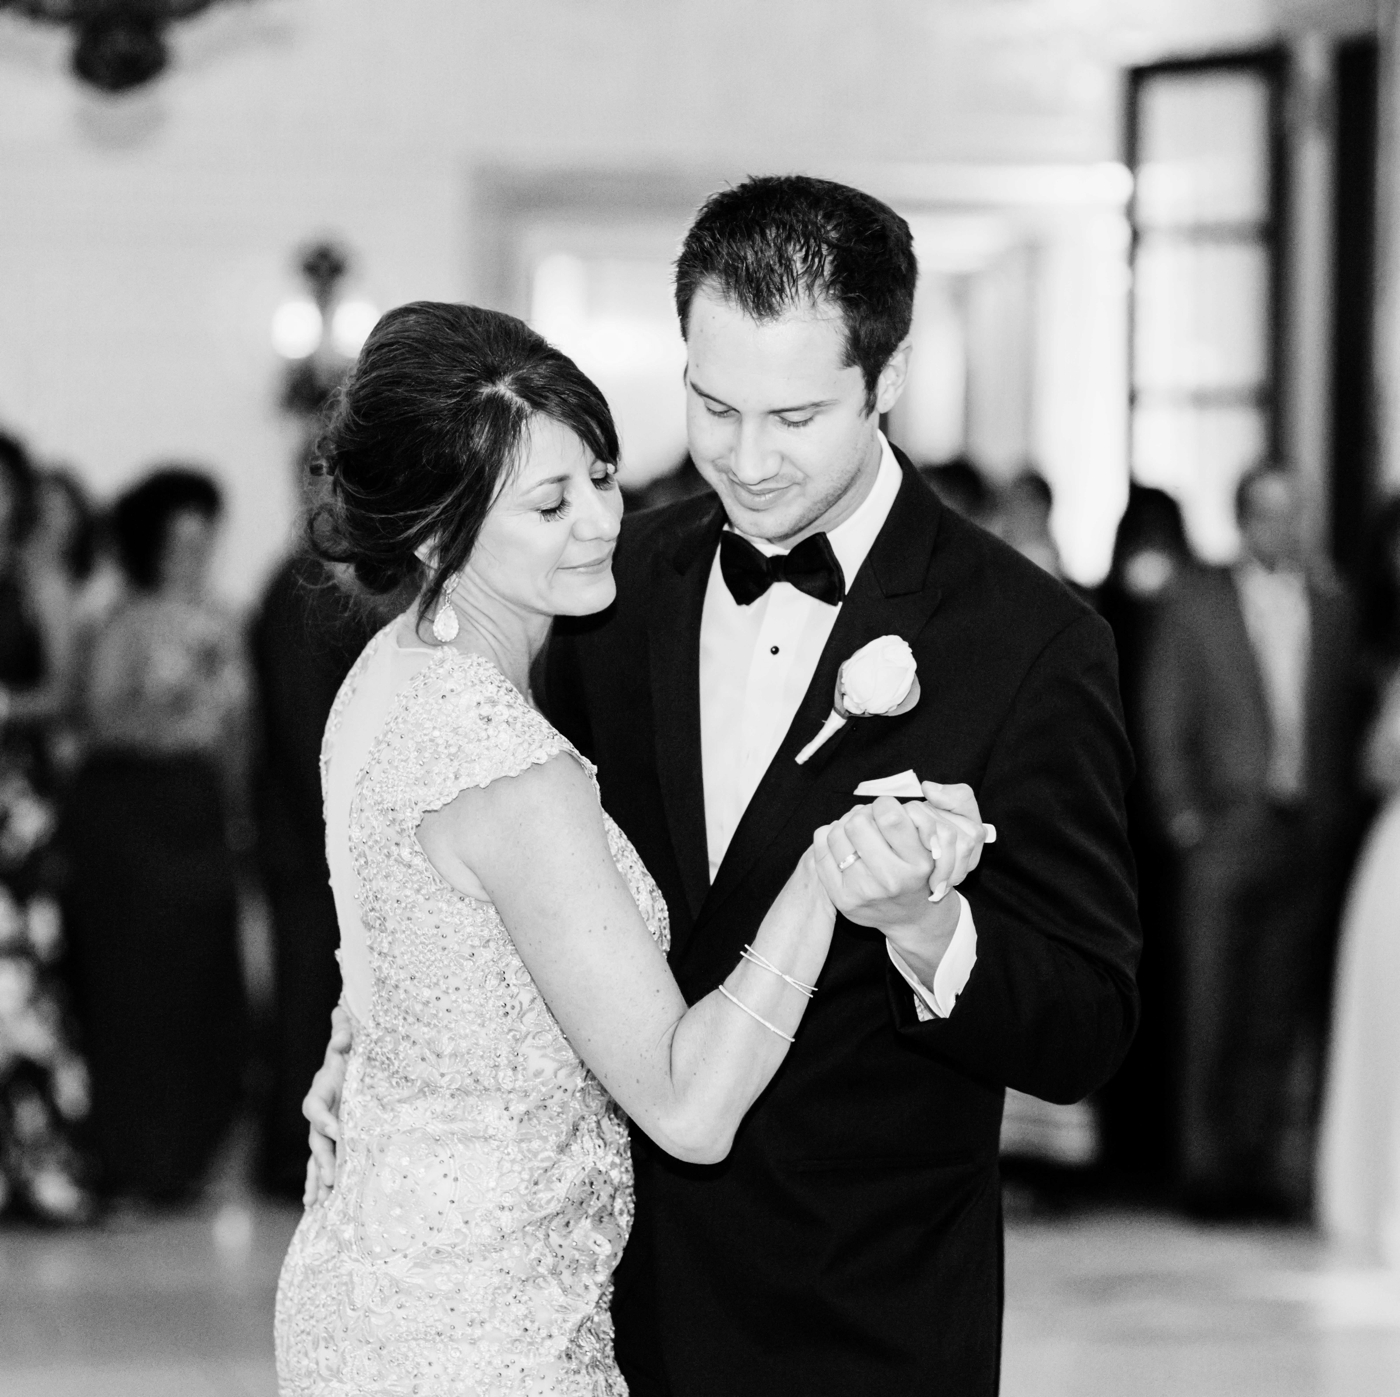 chicago-fine-art-wedding-photography-smeja56